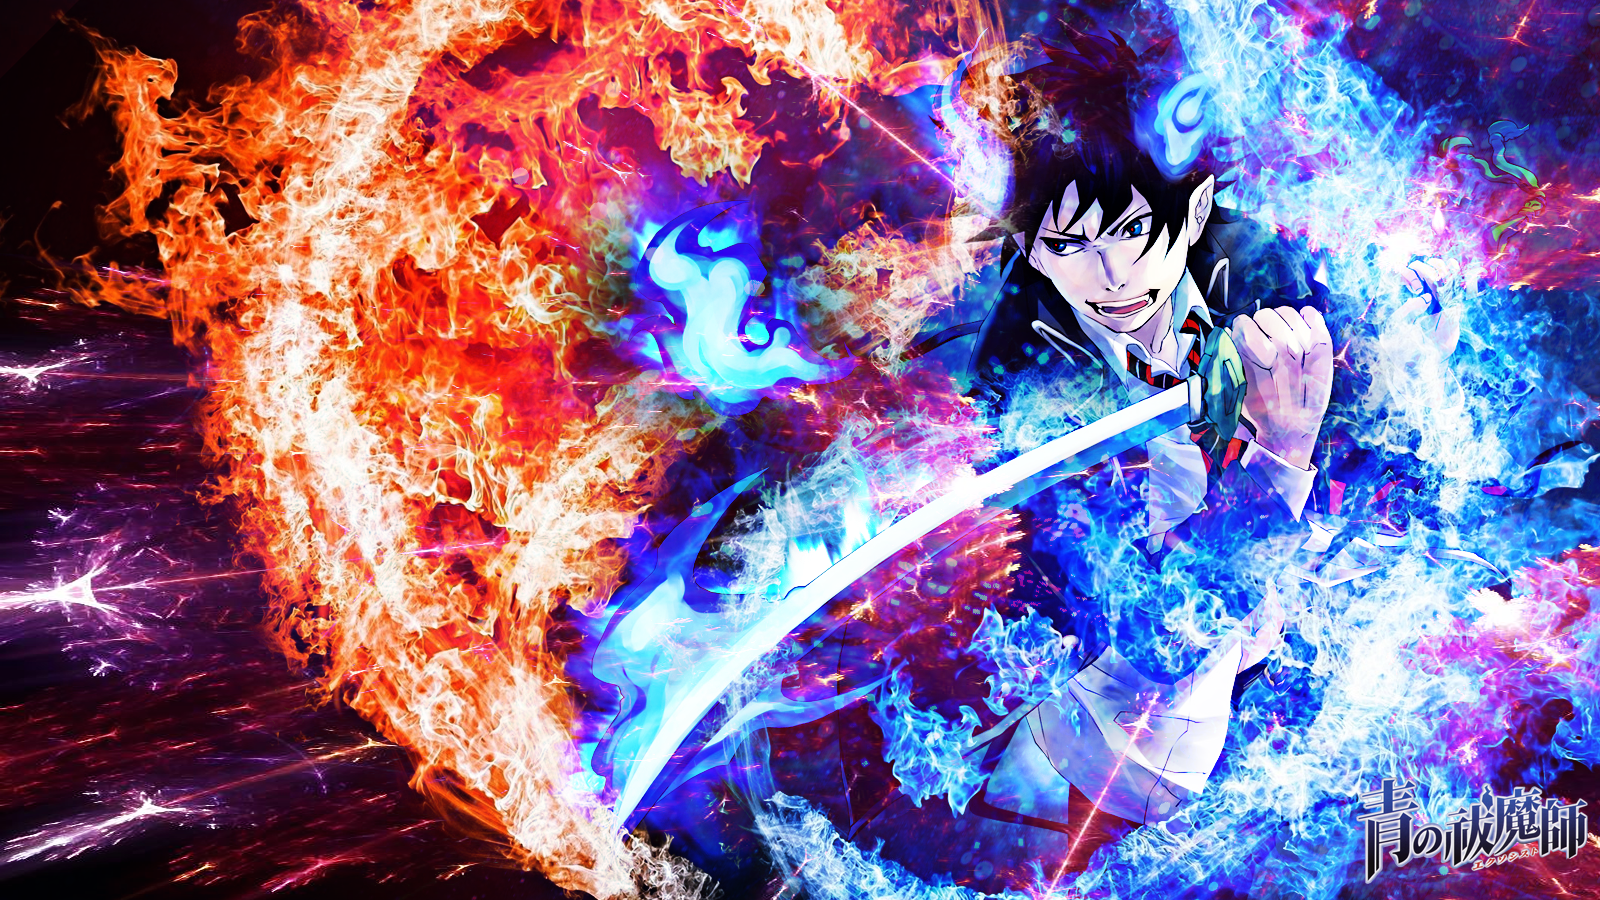 Blue Exorcist Wallpaper By Skeptec On Deviantart Blue Exorcist Exorcist Anime Blue Exorcist Rin